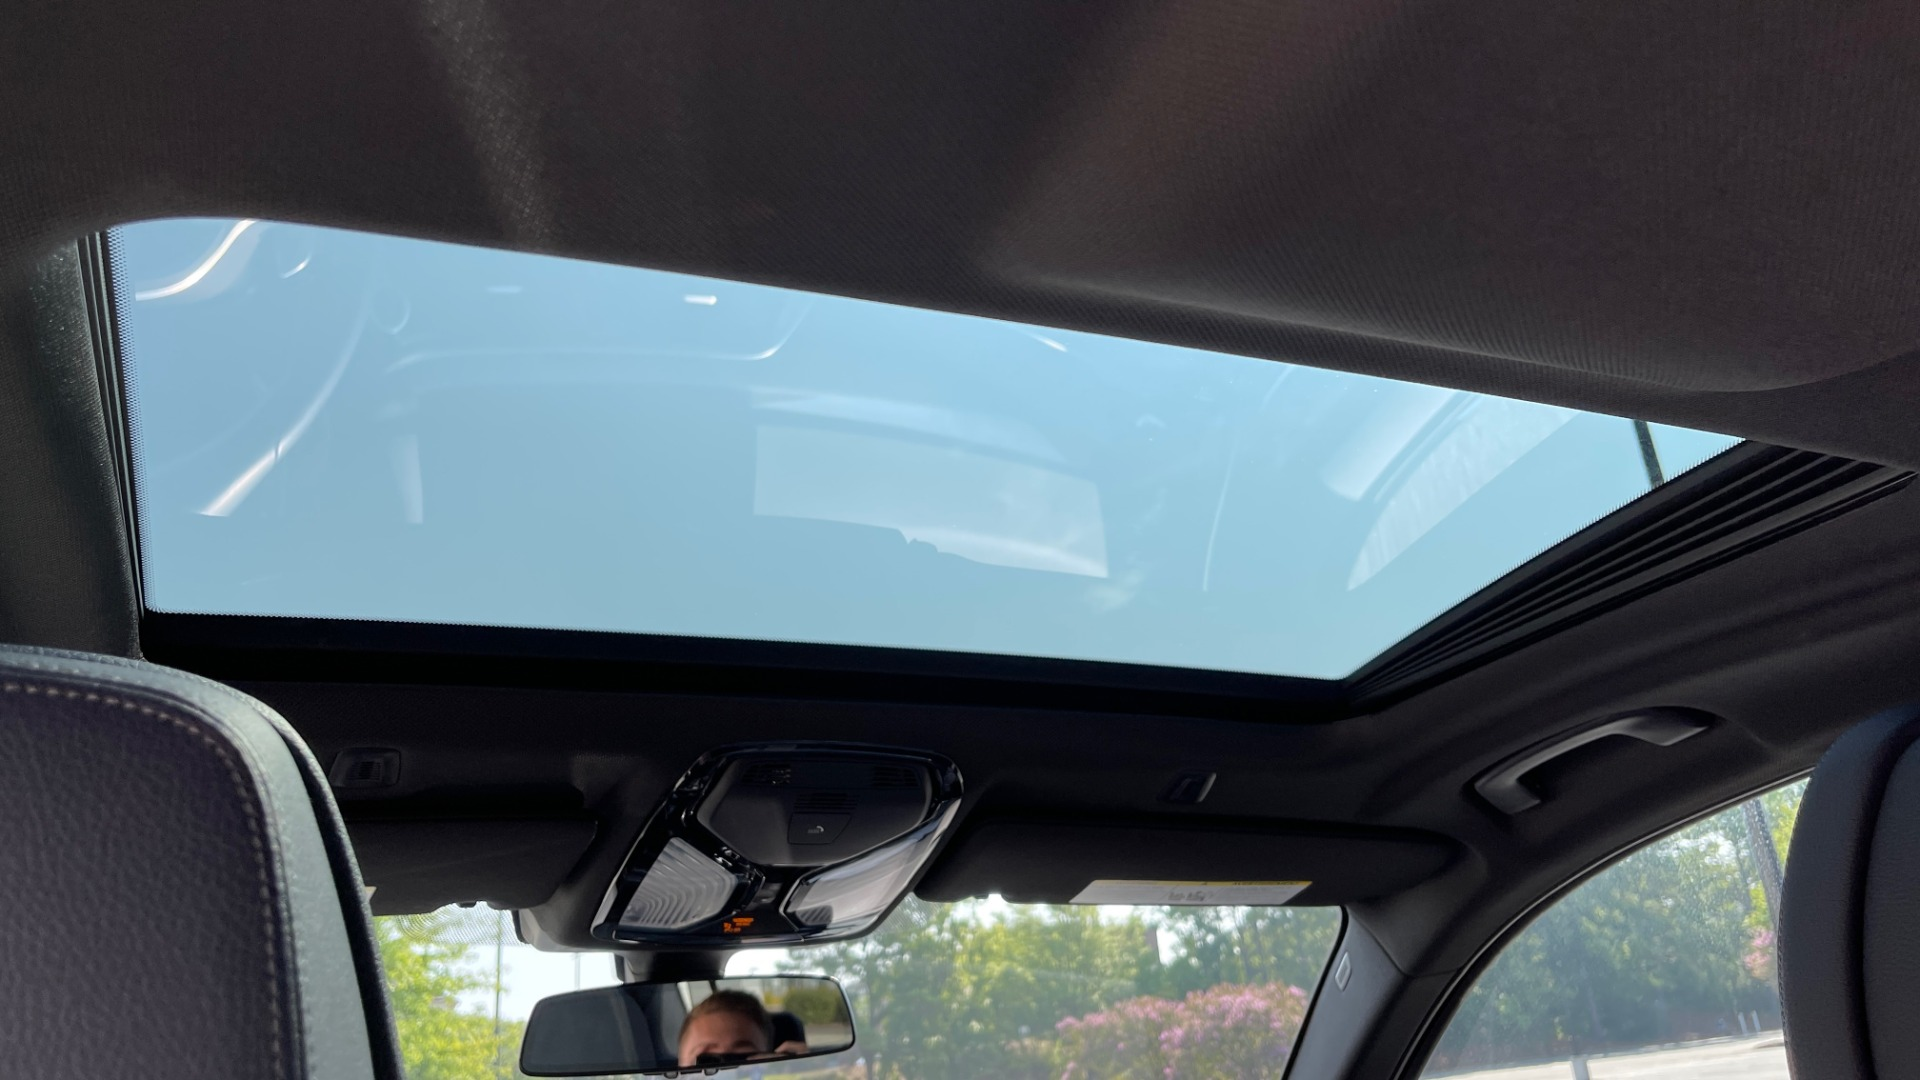 Used 2018 BMW 5 SERIES 540I XDRIVE M-SPORT / DRVR ASST / PDC / APPLE / HUD / H/K SND for sale $42,795 at Formula Imports in Charlotte NC 28227 57